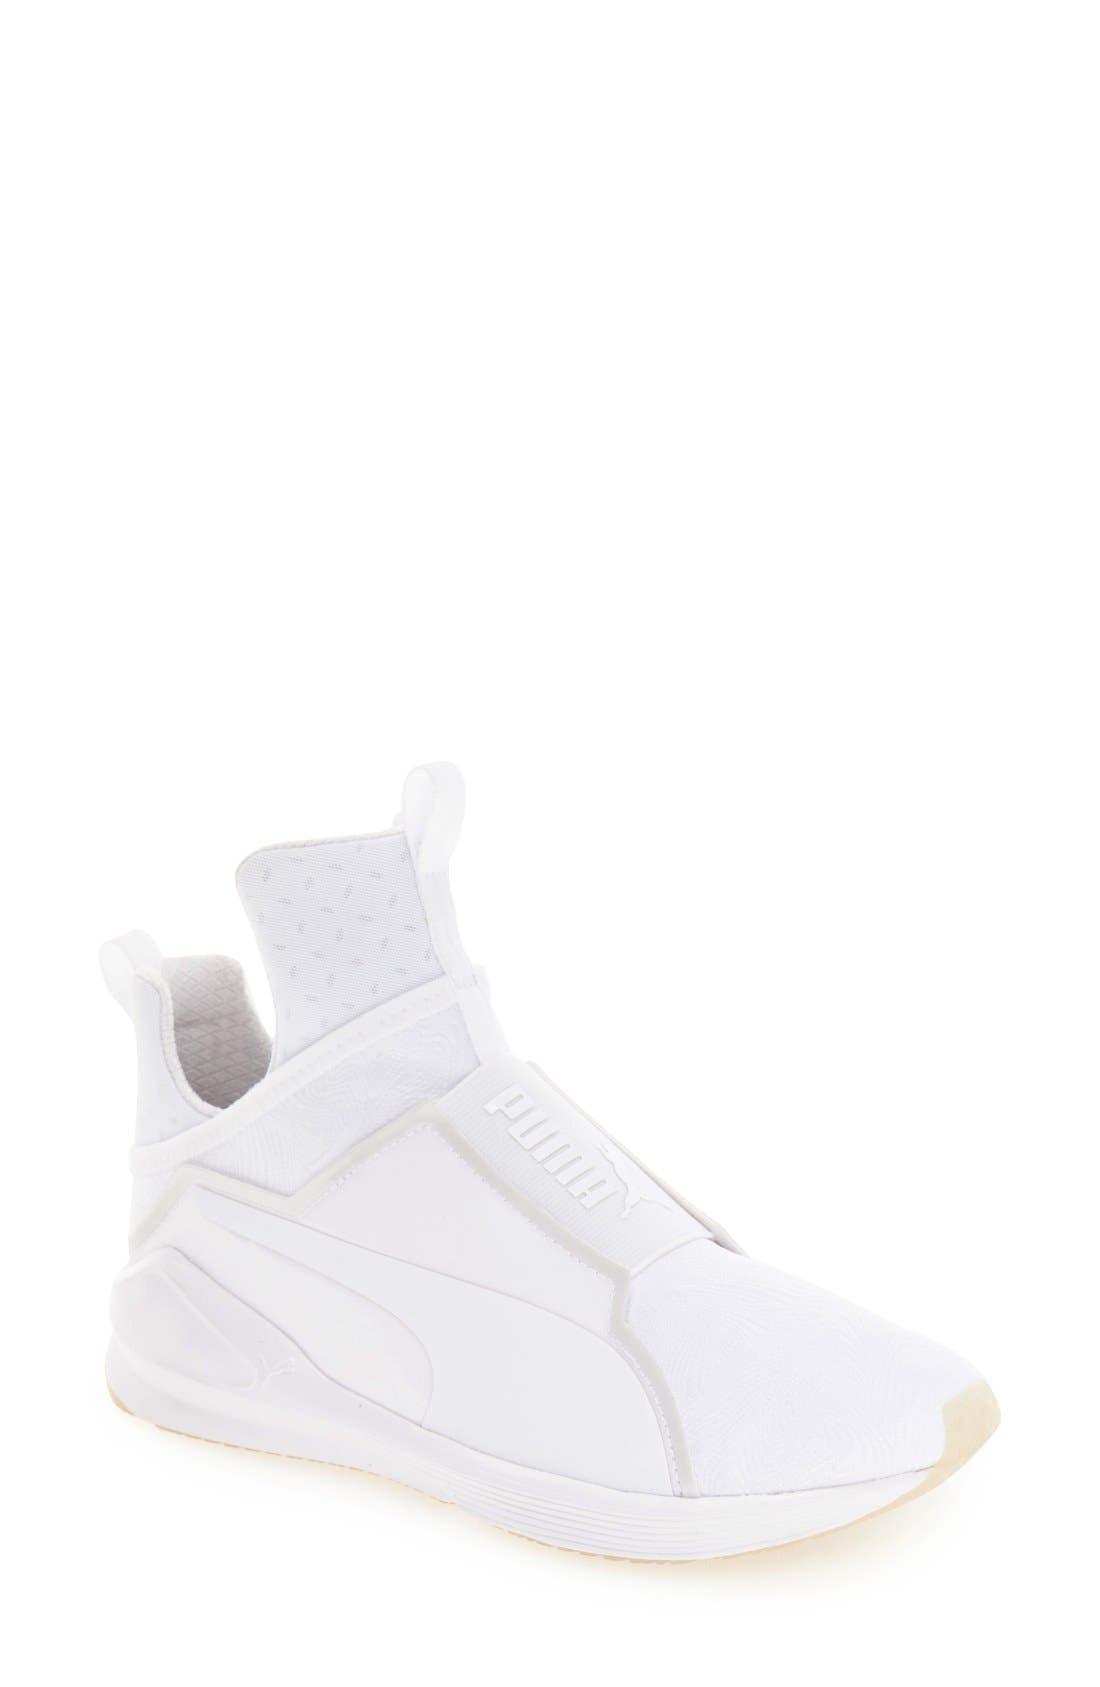 PUMA,                             'Fierce Bright' Sneaker,                             Main thumbnail 1, color,                             100